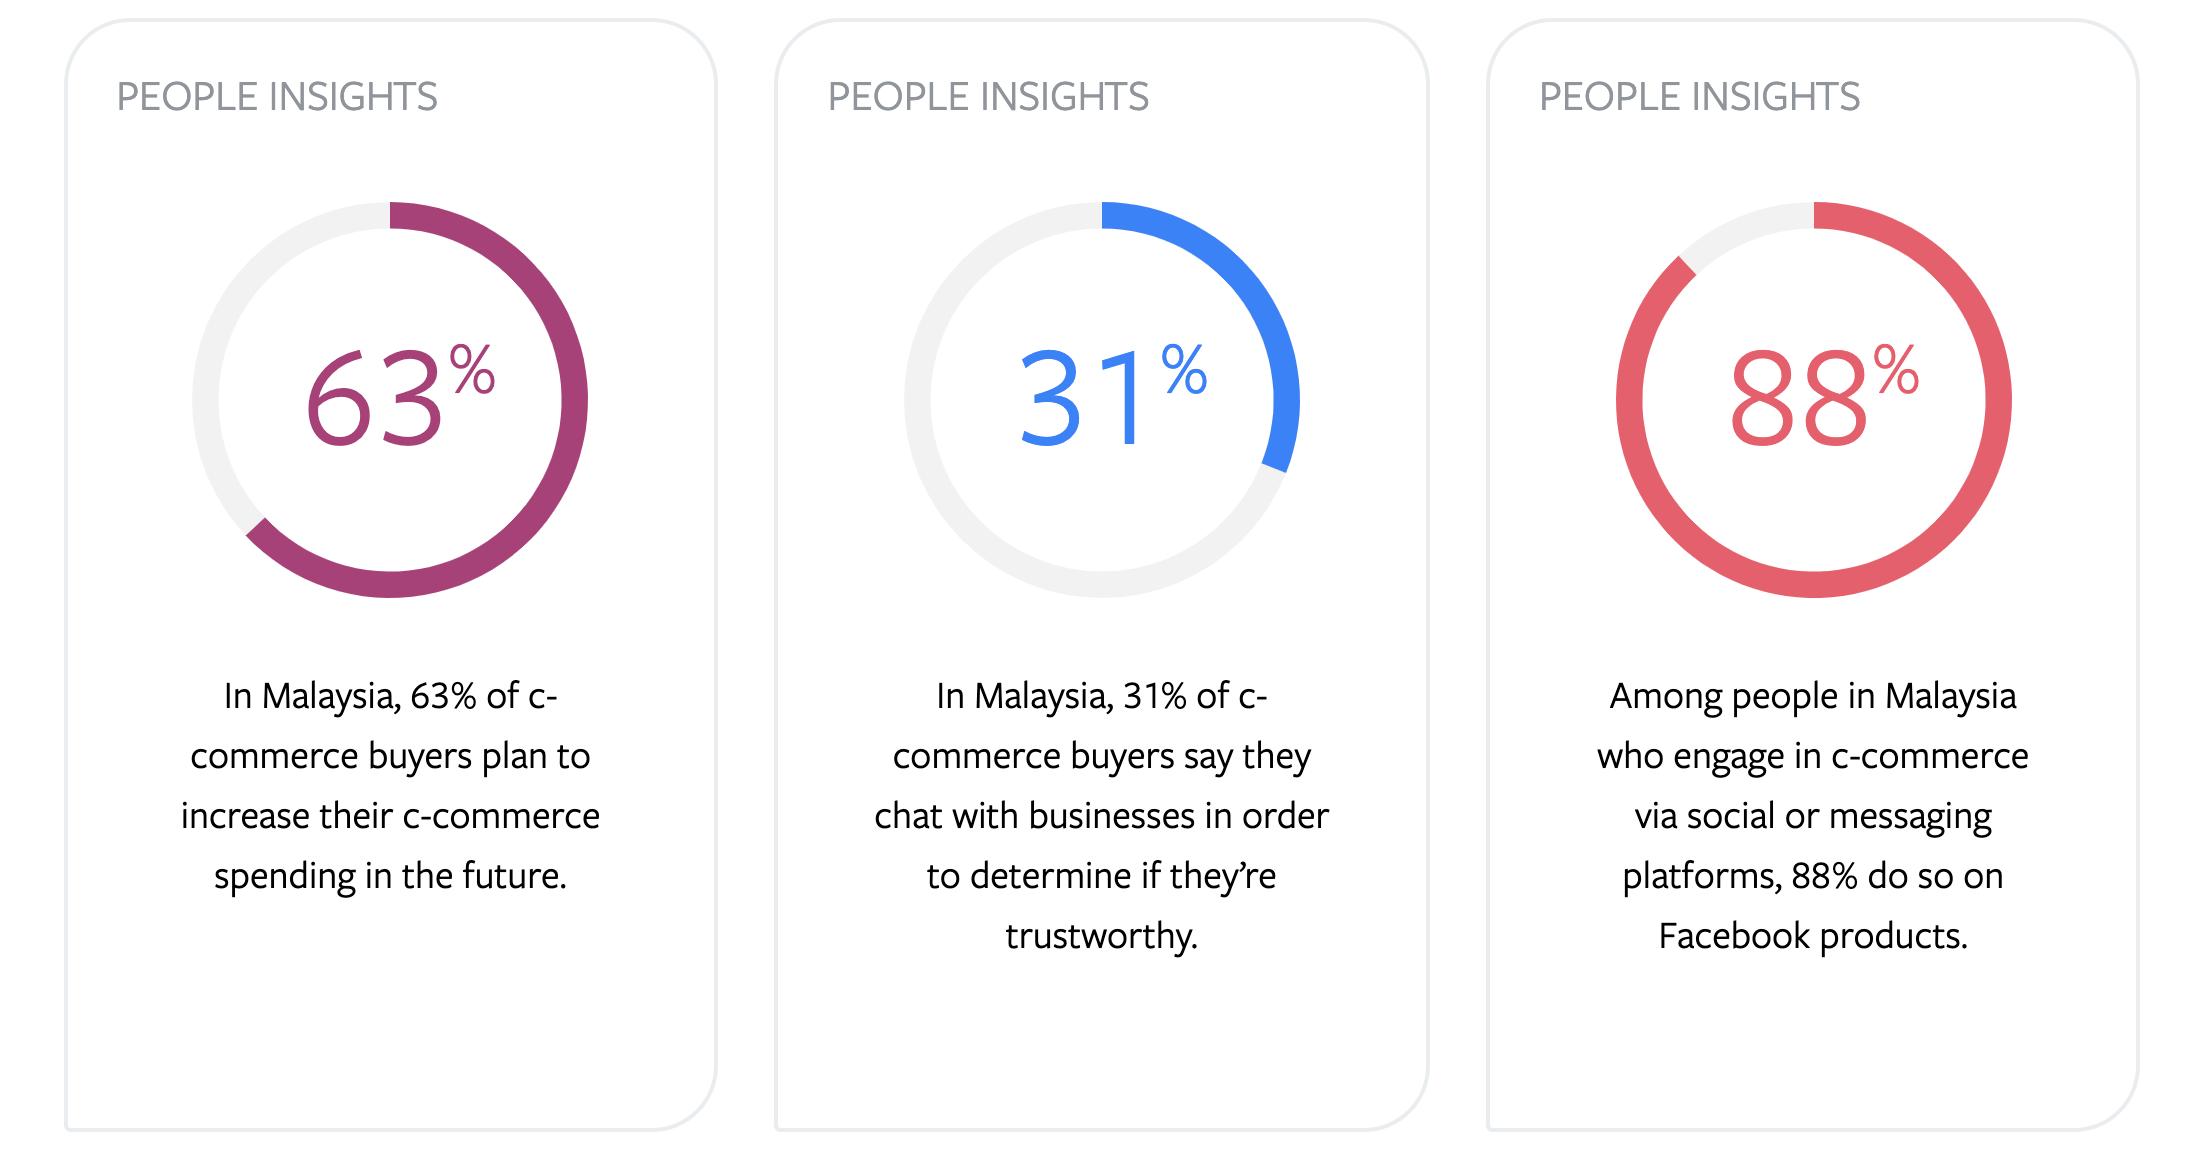 Malaysia Facebook IQ Insights to Go statistics